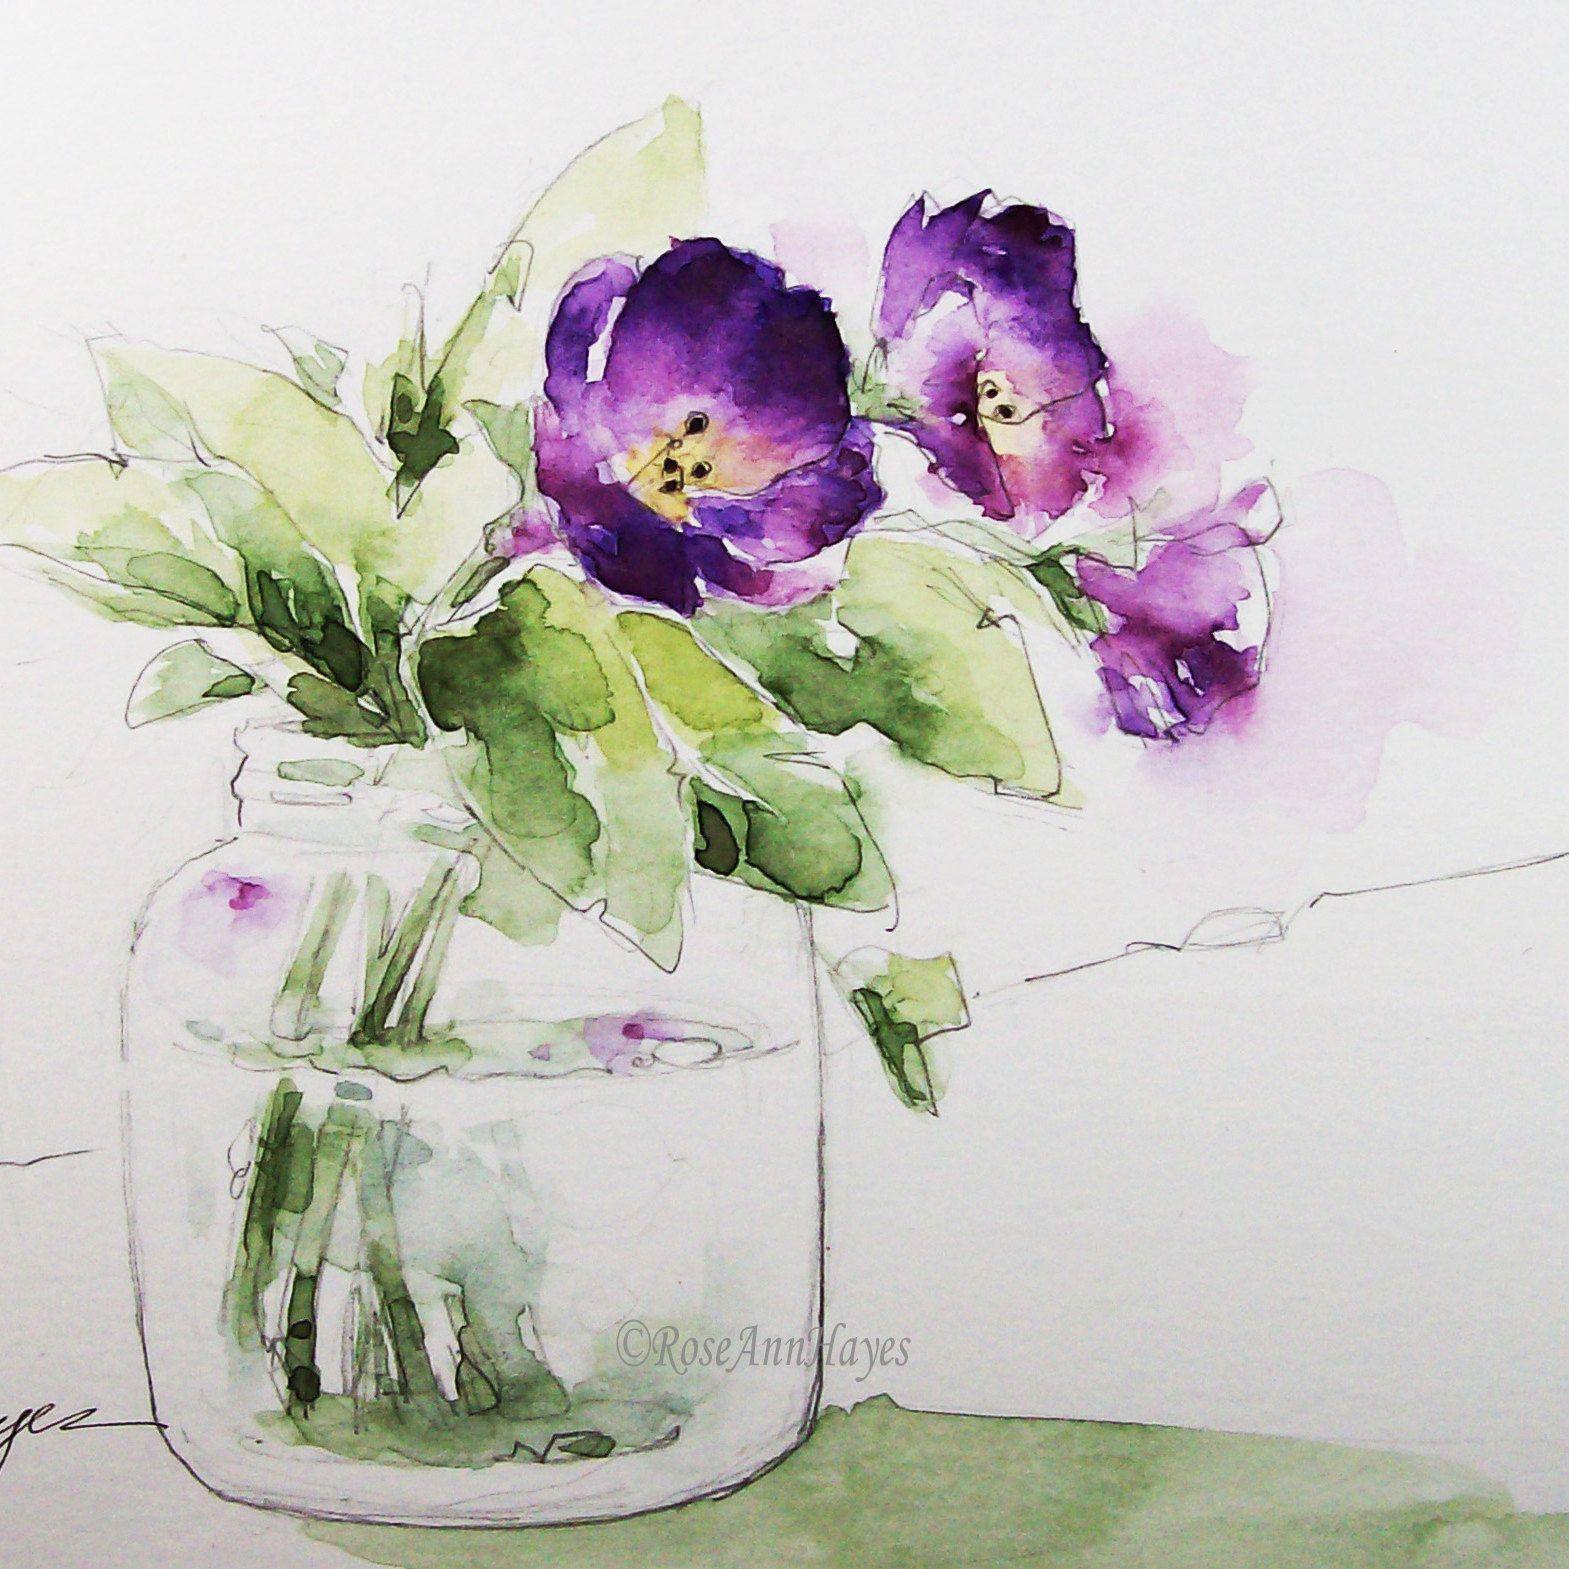 Watercolor Paintings By Roseann Hayes By Roseannhayes On Etsy